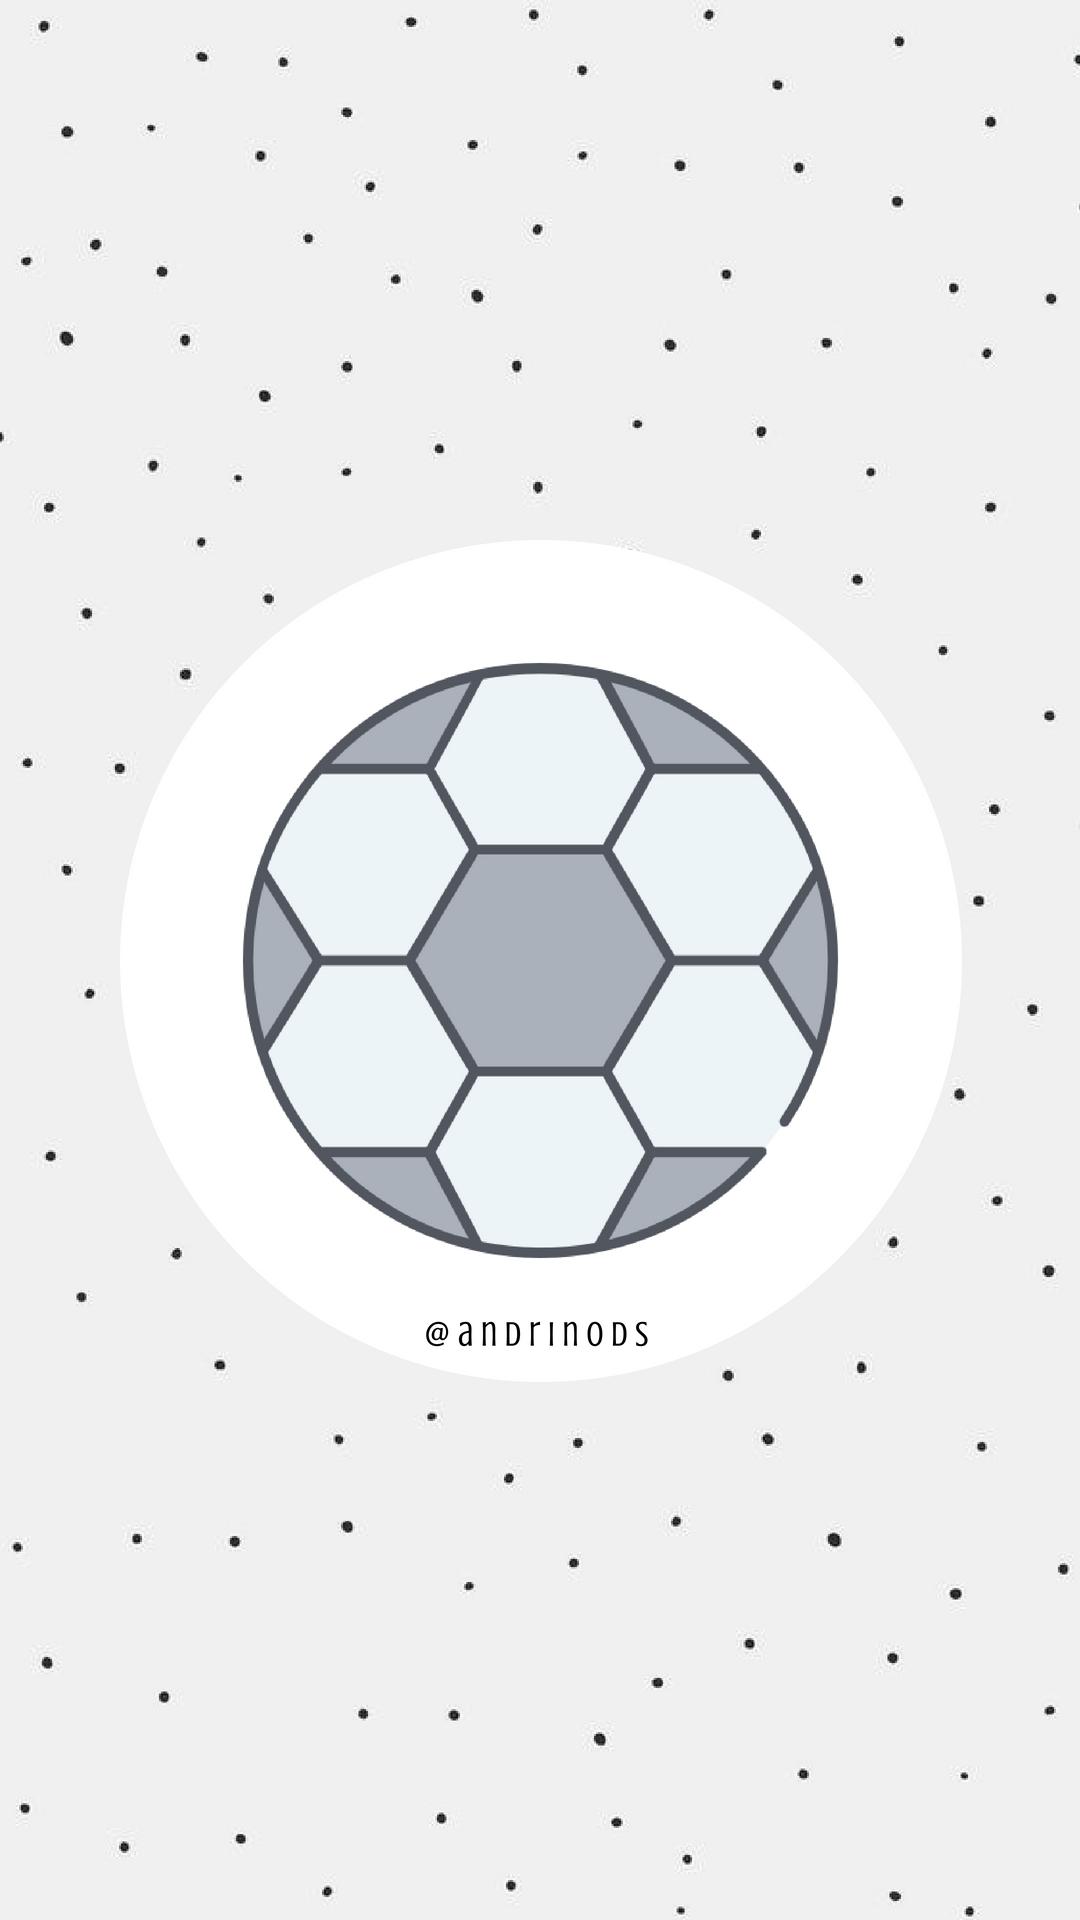 Stephania Andrinods Fotos Y Videos De Instagram Instagram Highlight Icons Sport Icon Instagram Icons